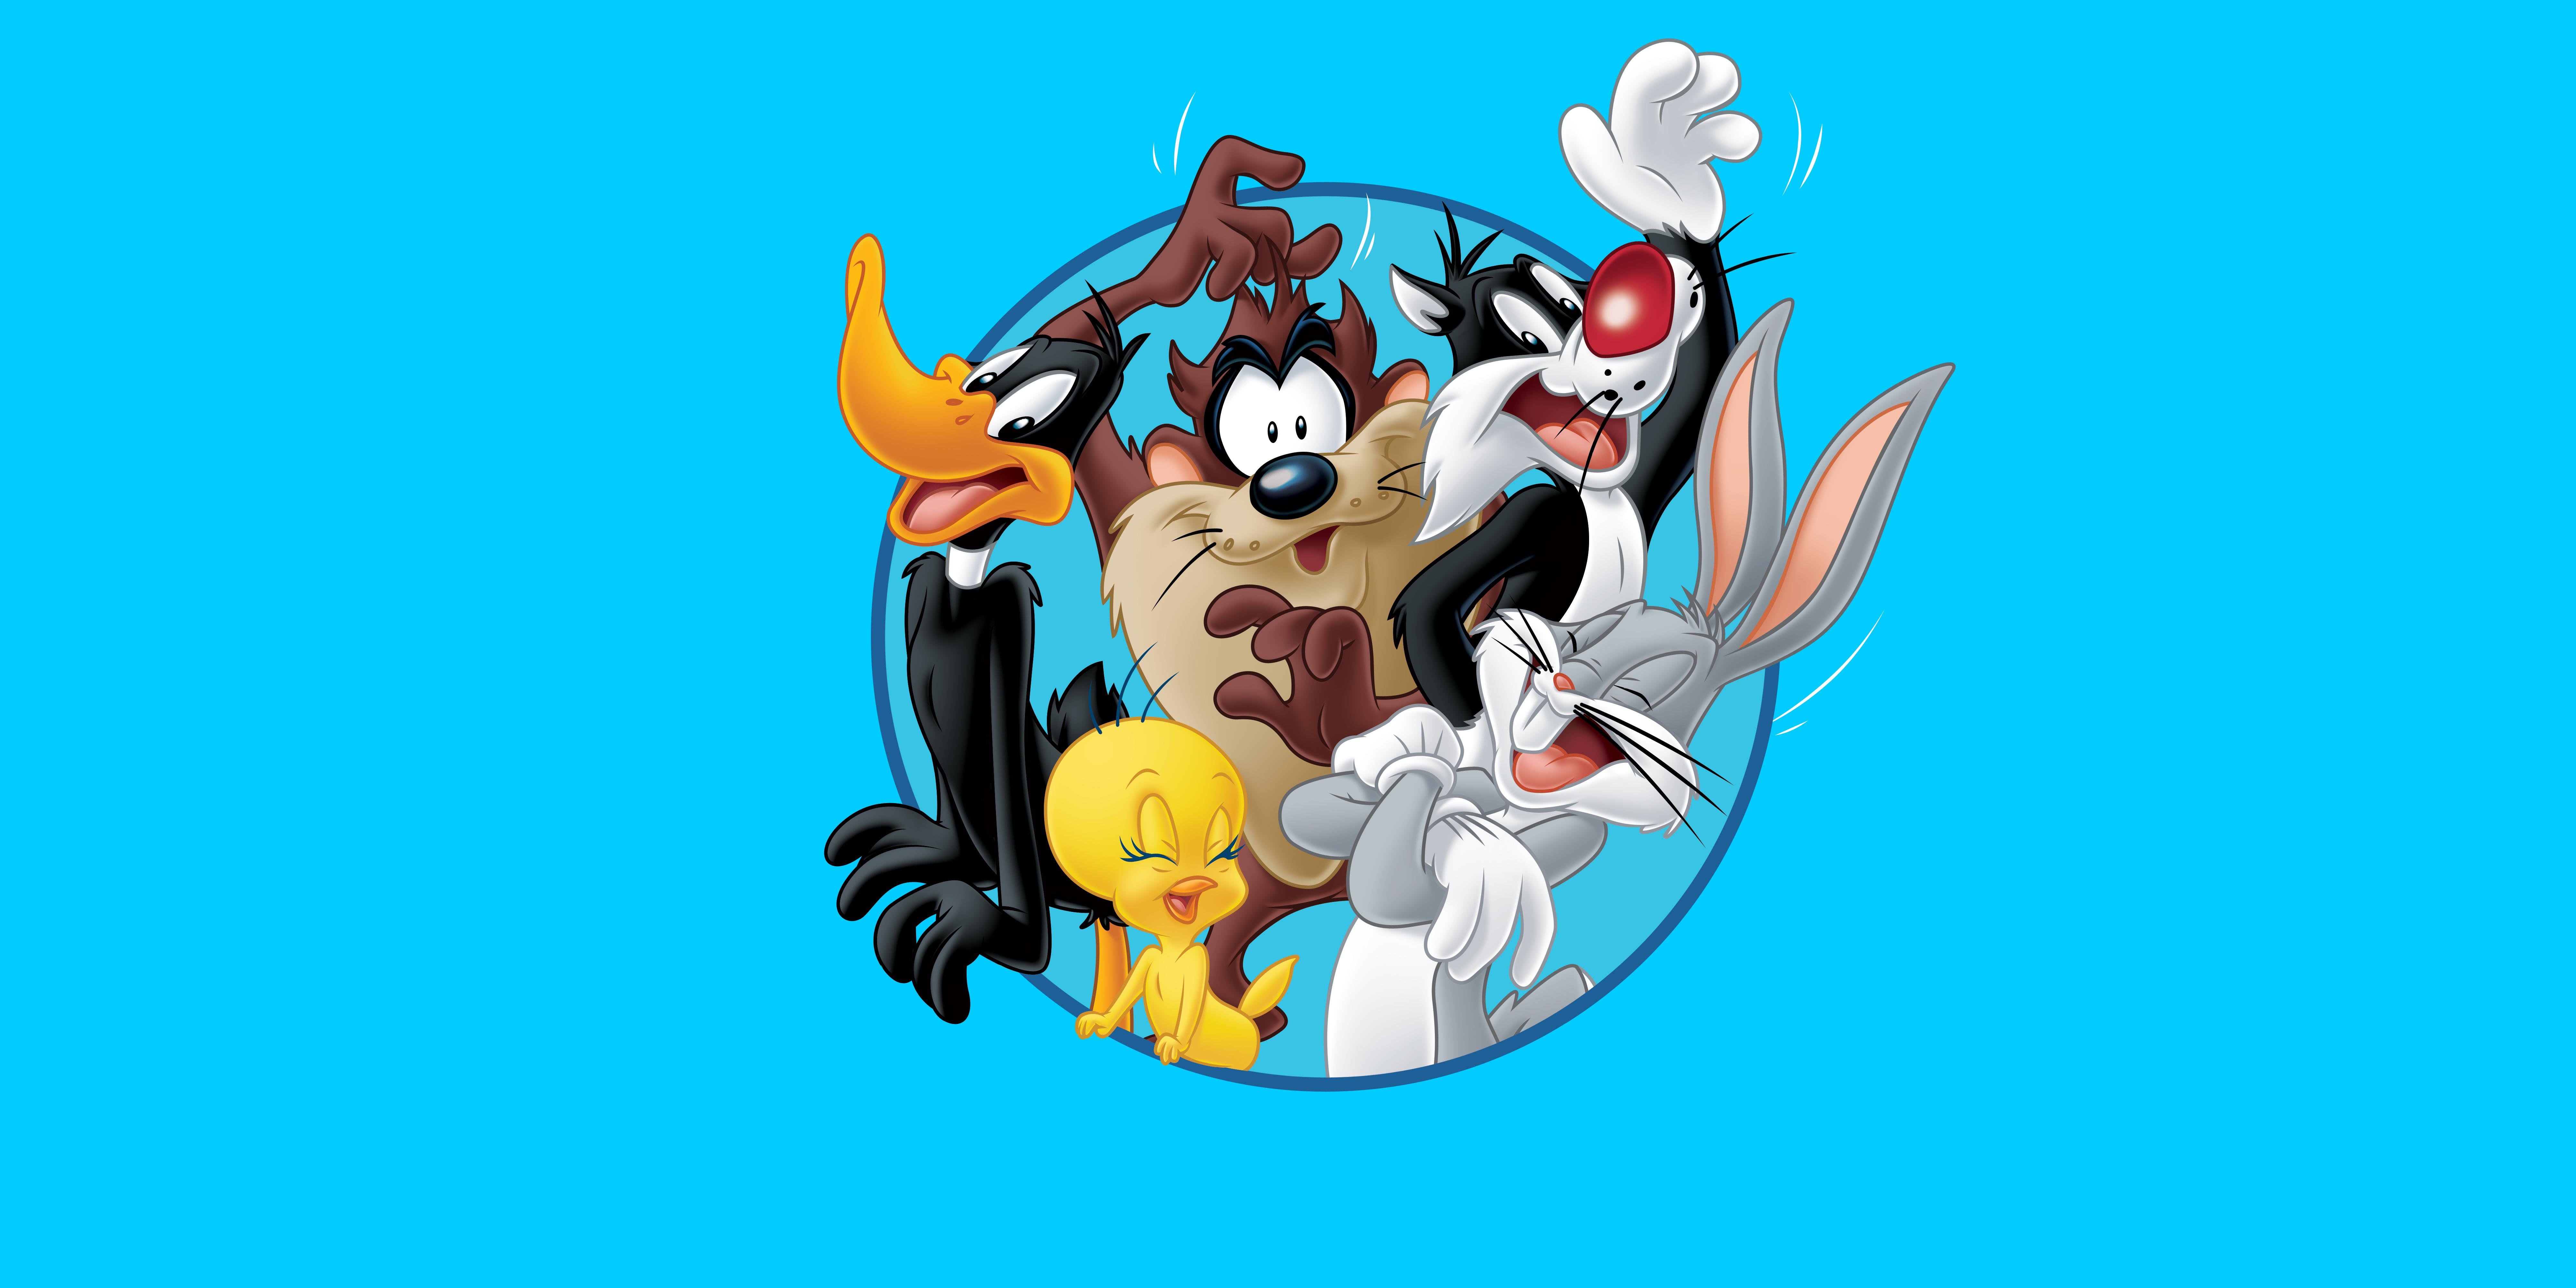 looney tunes bugs bunny daffy duck tasmanian devil tweety bugs bunny 8000x4000